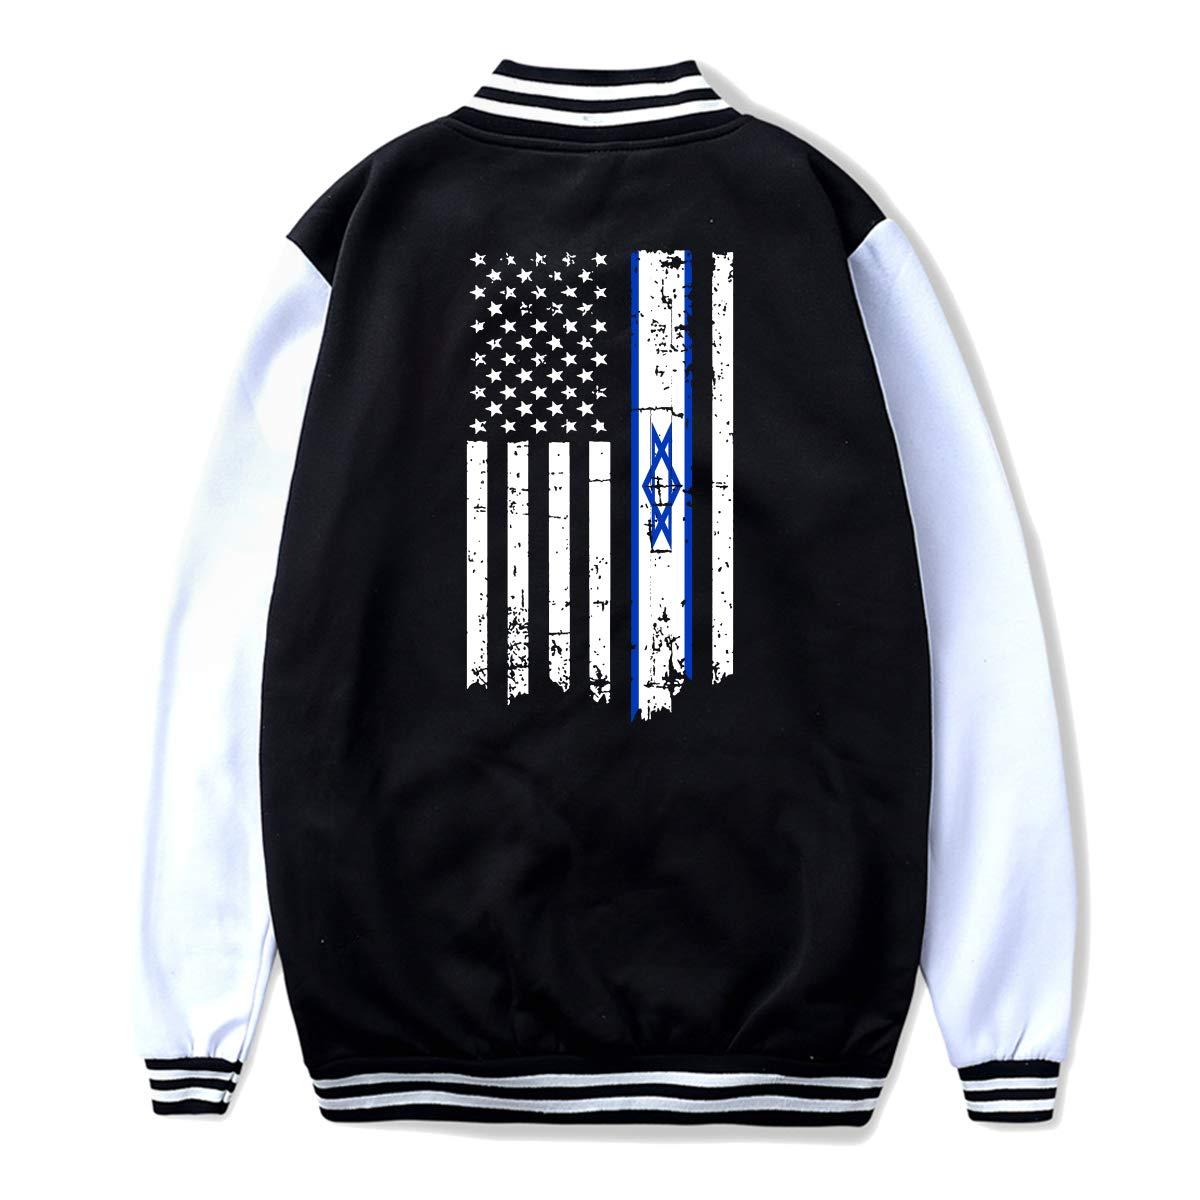 Back Print NJKM5MJ Unisex Teen Baseball Uniform Jacket Israel American Thin Line Flag Hoodie Coat Sweater Sweatshirt